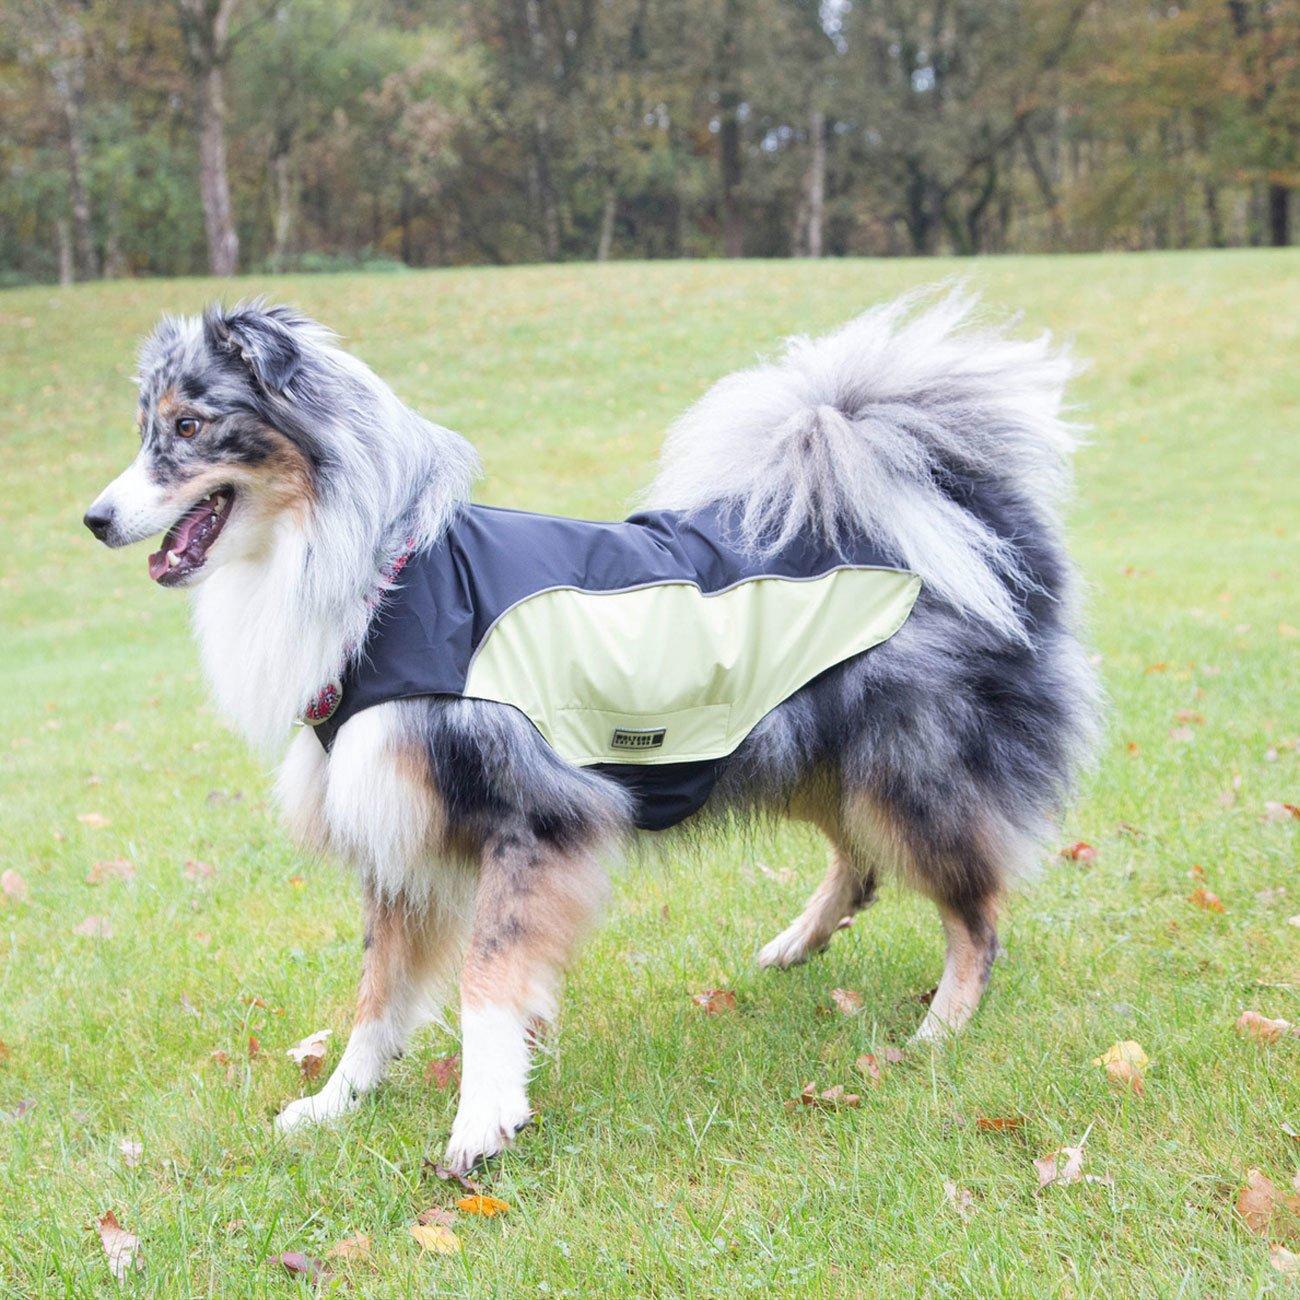 Wolters Regenjacke für Hunde Easy Rain, Bild 2